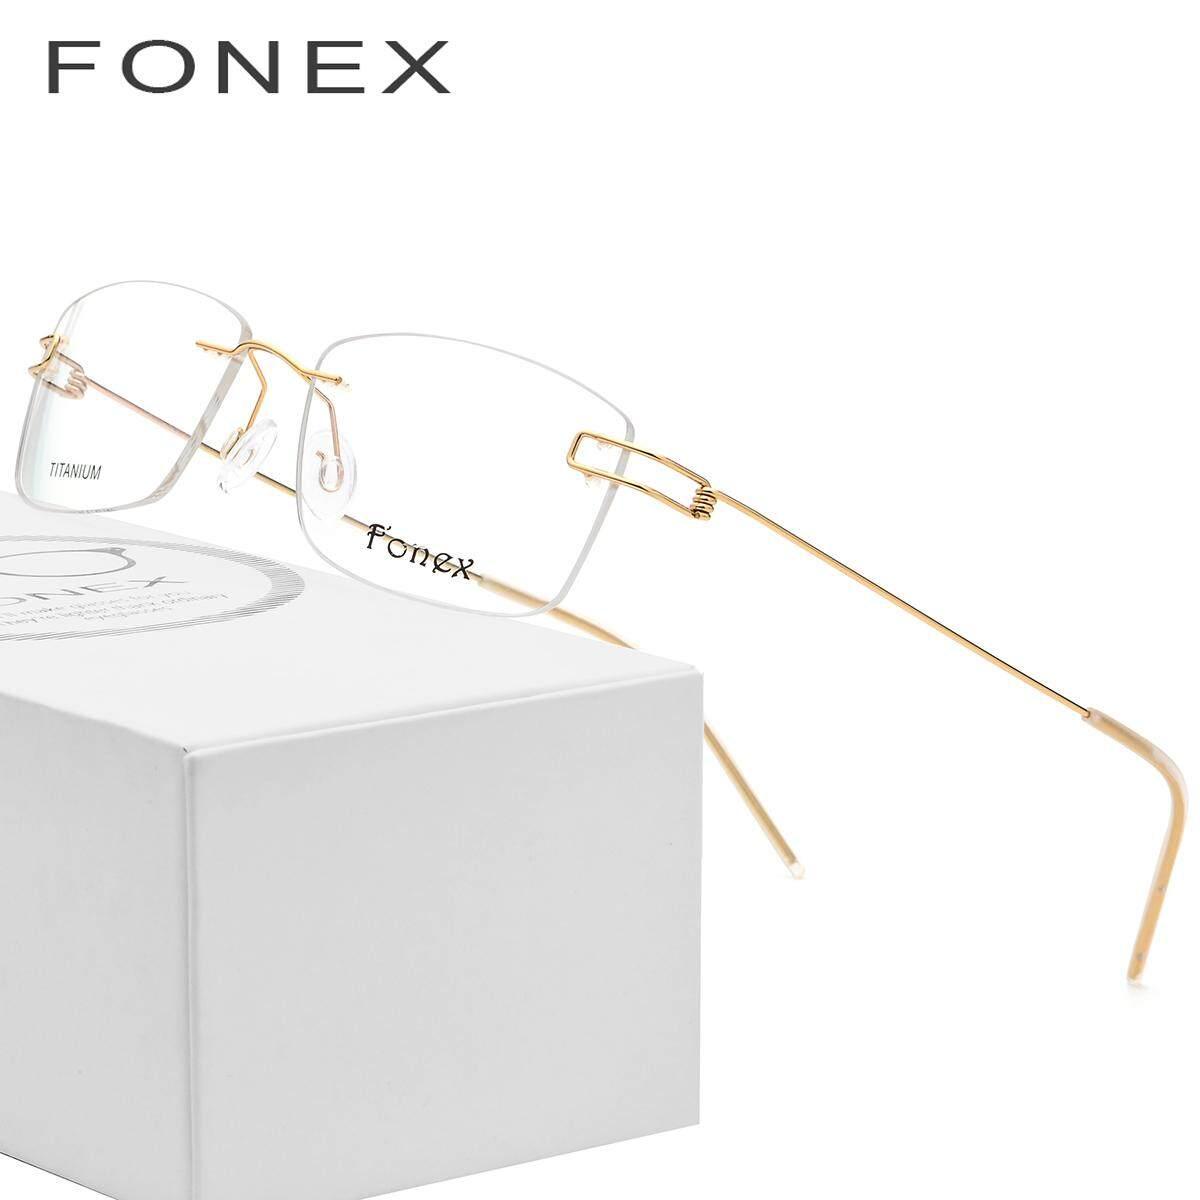 e1826767c3 HJC FONEX Screwless Eyewear Korean Glasses Frames Frameless Titanium Alloy  Prescription Eyeglasses Myopia Optical Frame Silhouett